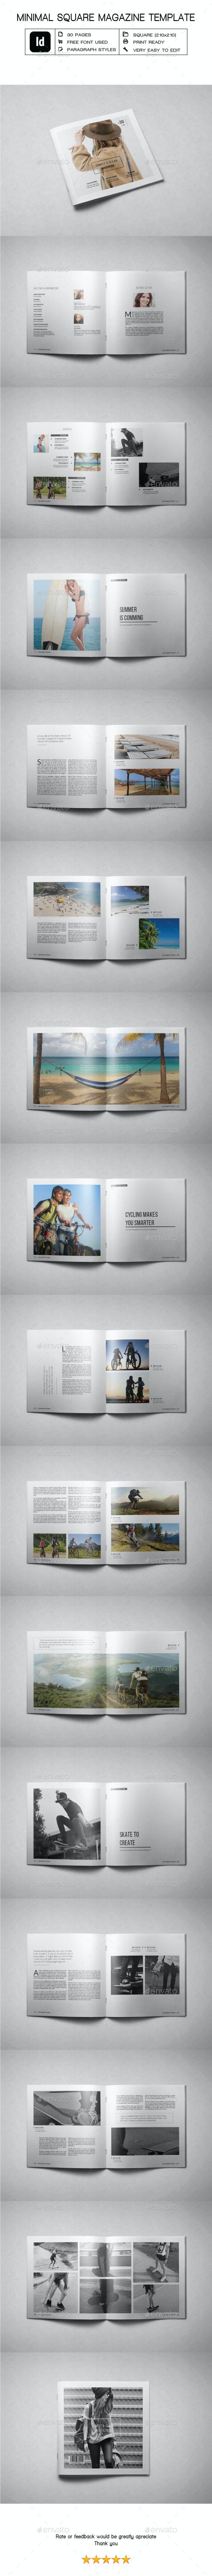 Minimal Square Magazine Template IV - Magazines Print Templates